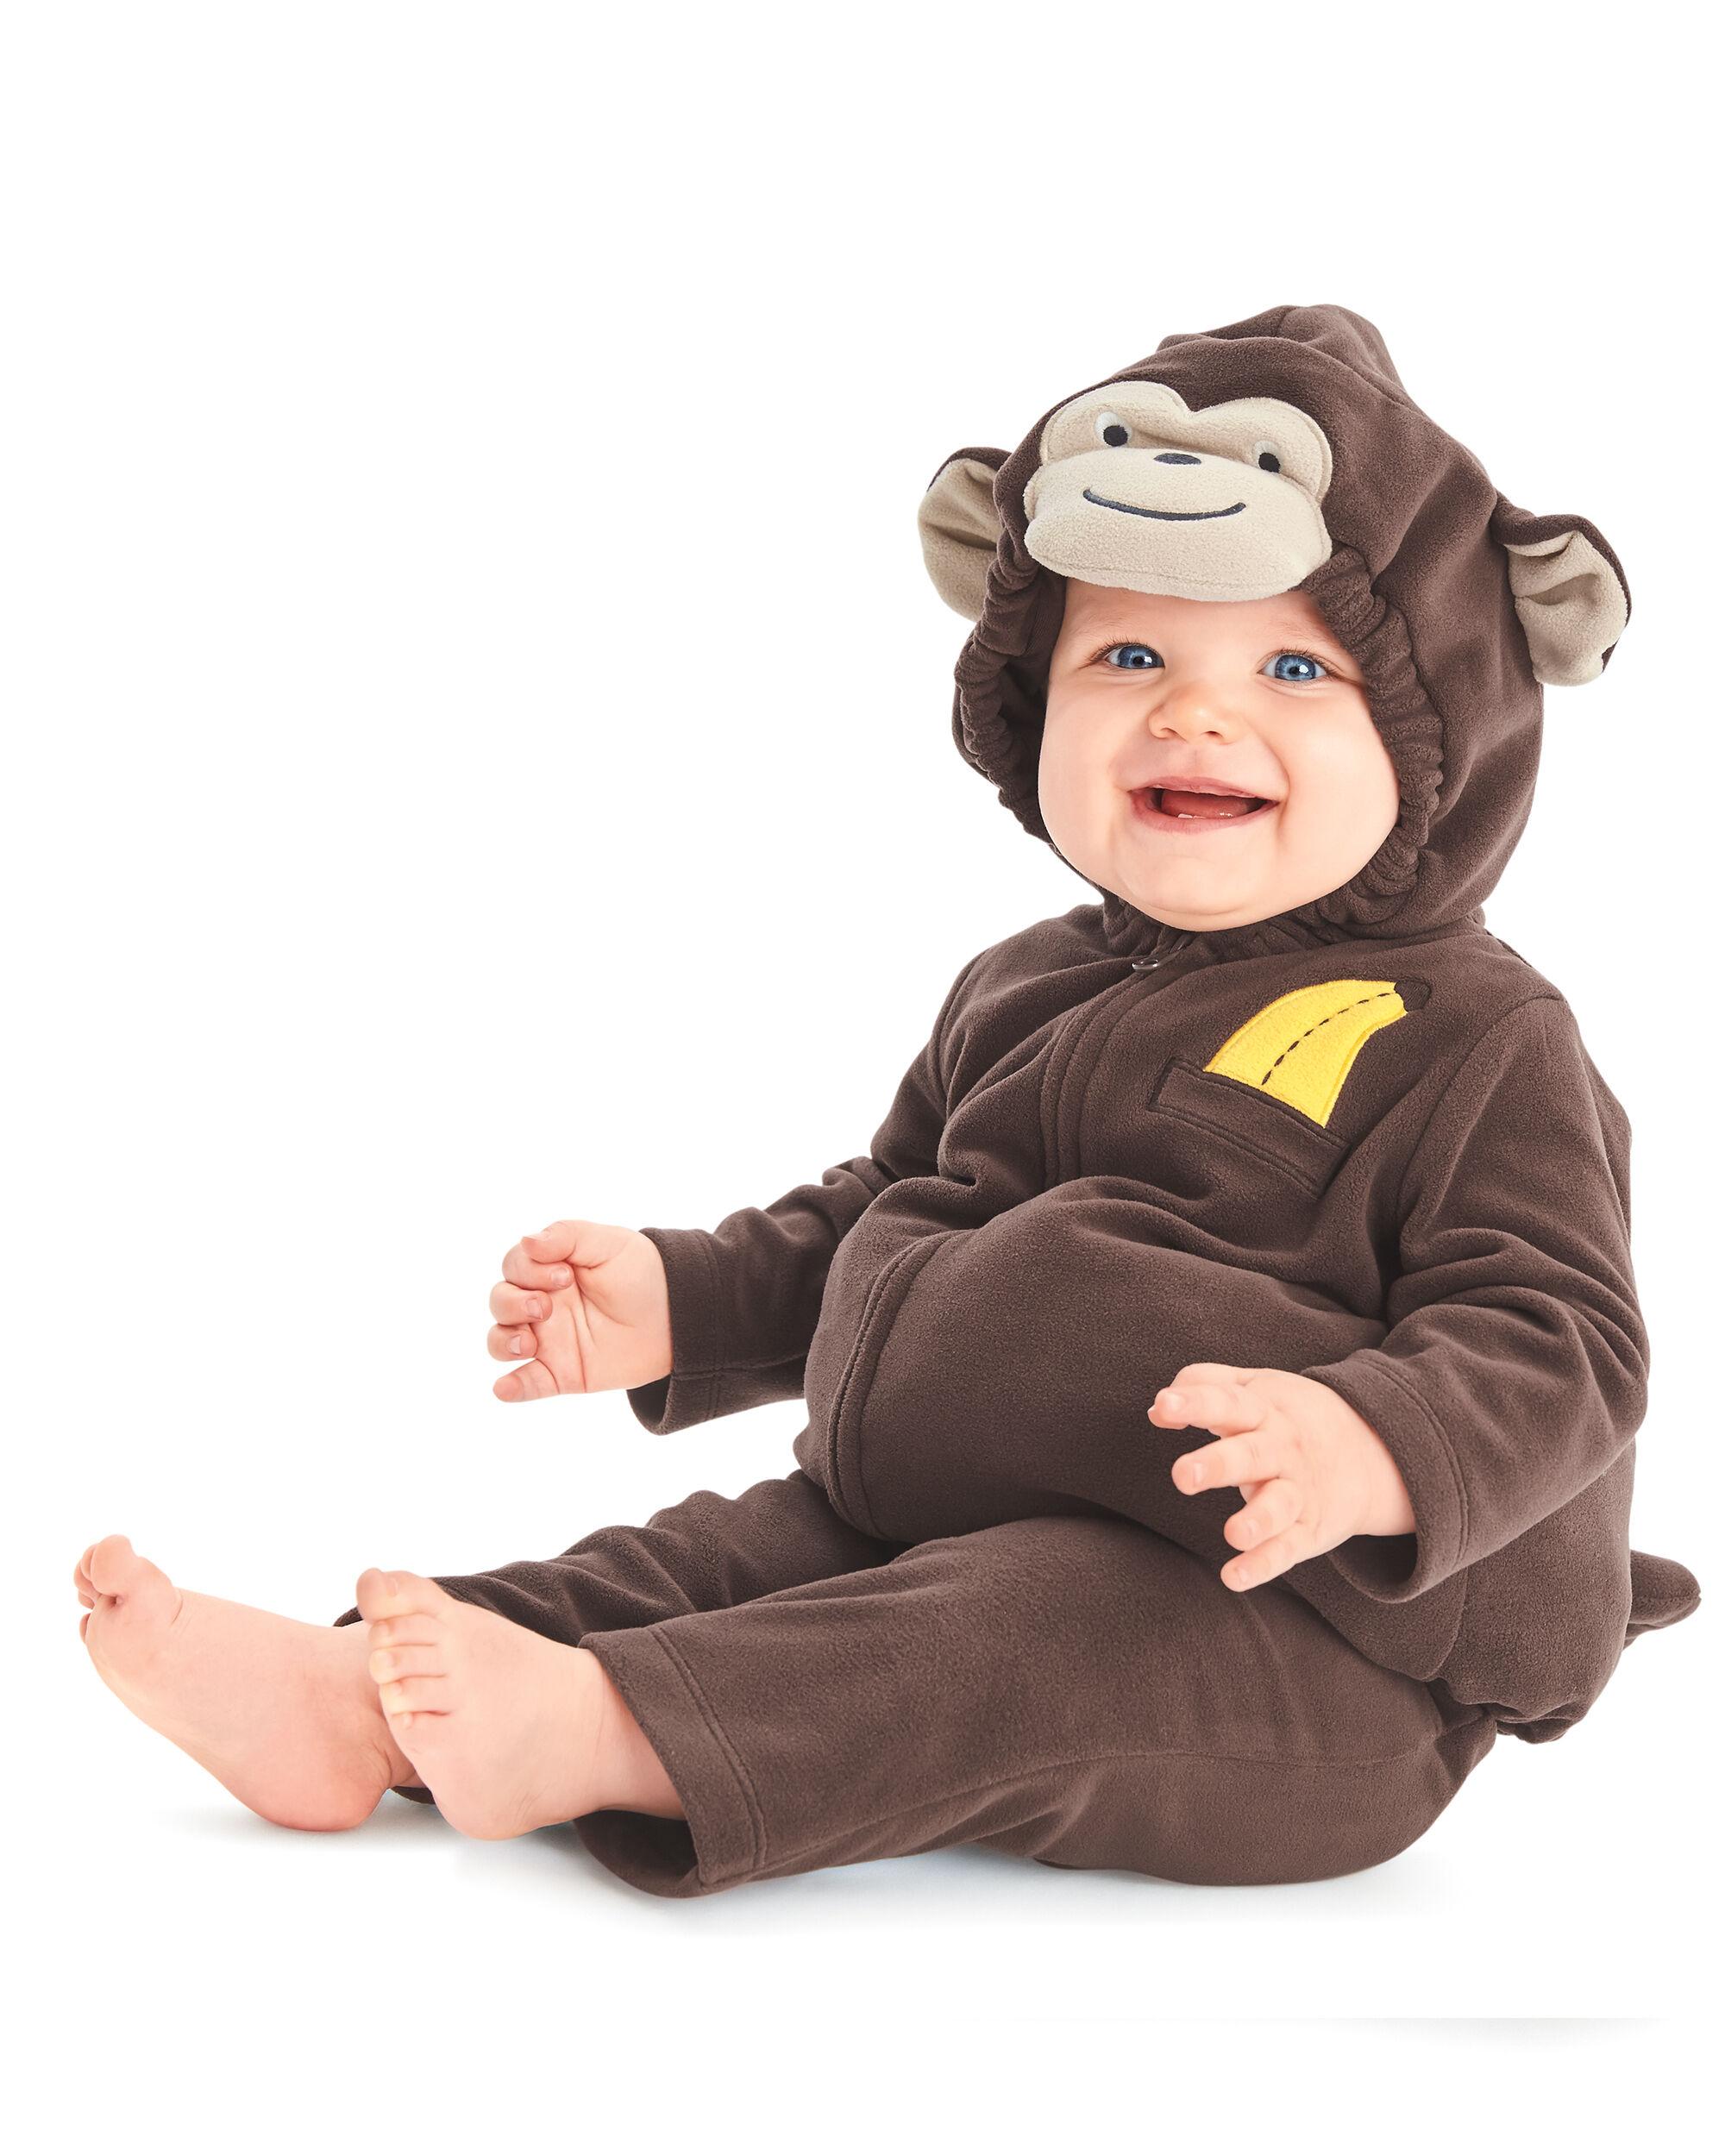 Little Monkey Halloween Costume ...  sc 1 st  Carteru0027s & Little Monkey Halloween Costume | Carters.com